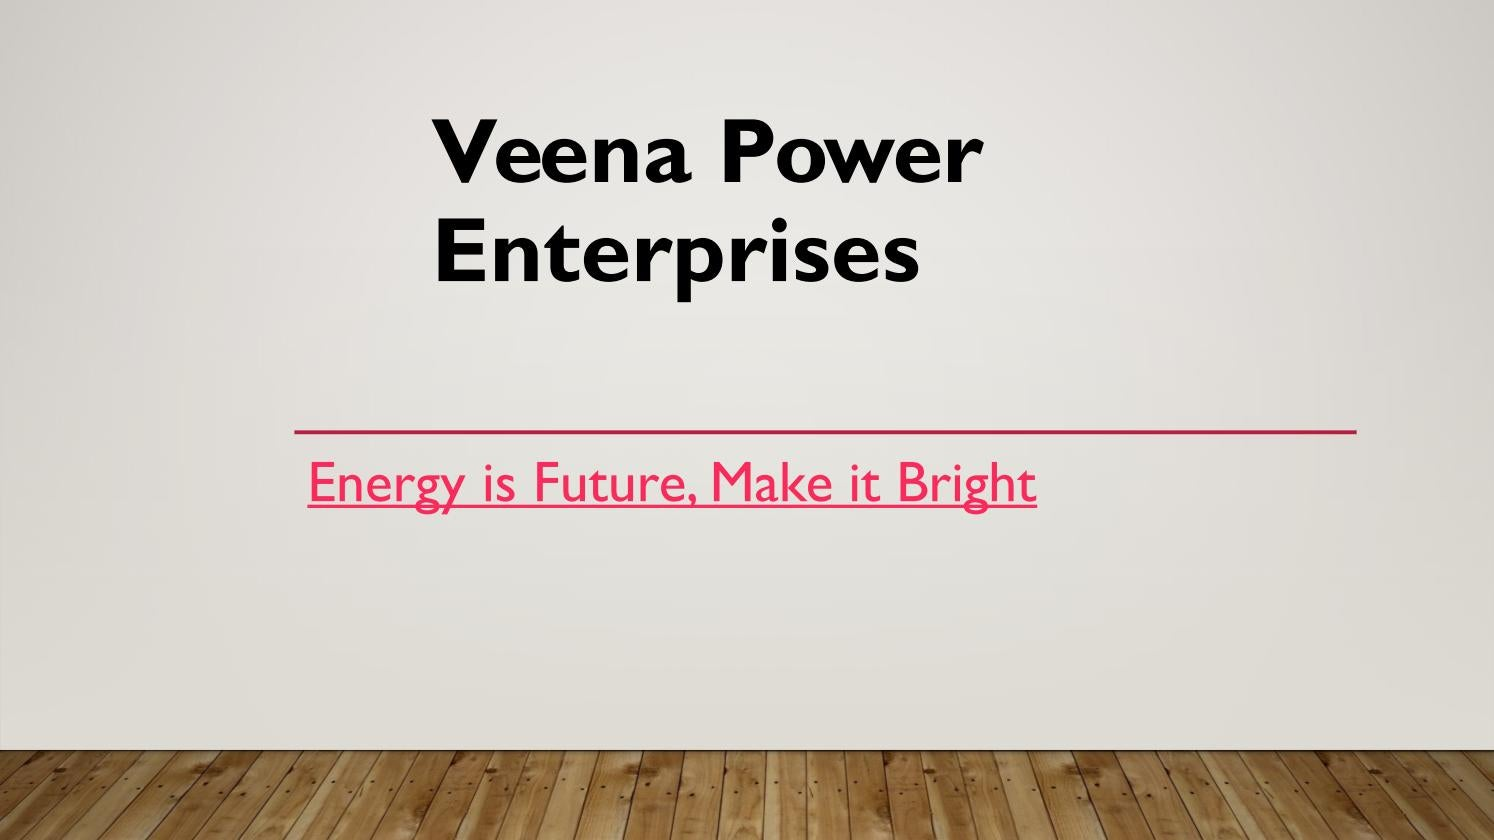 Best Solar Panels in India - Veena Power Enterprises by